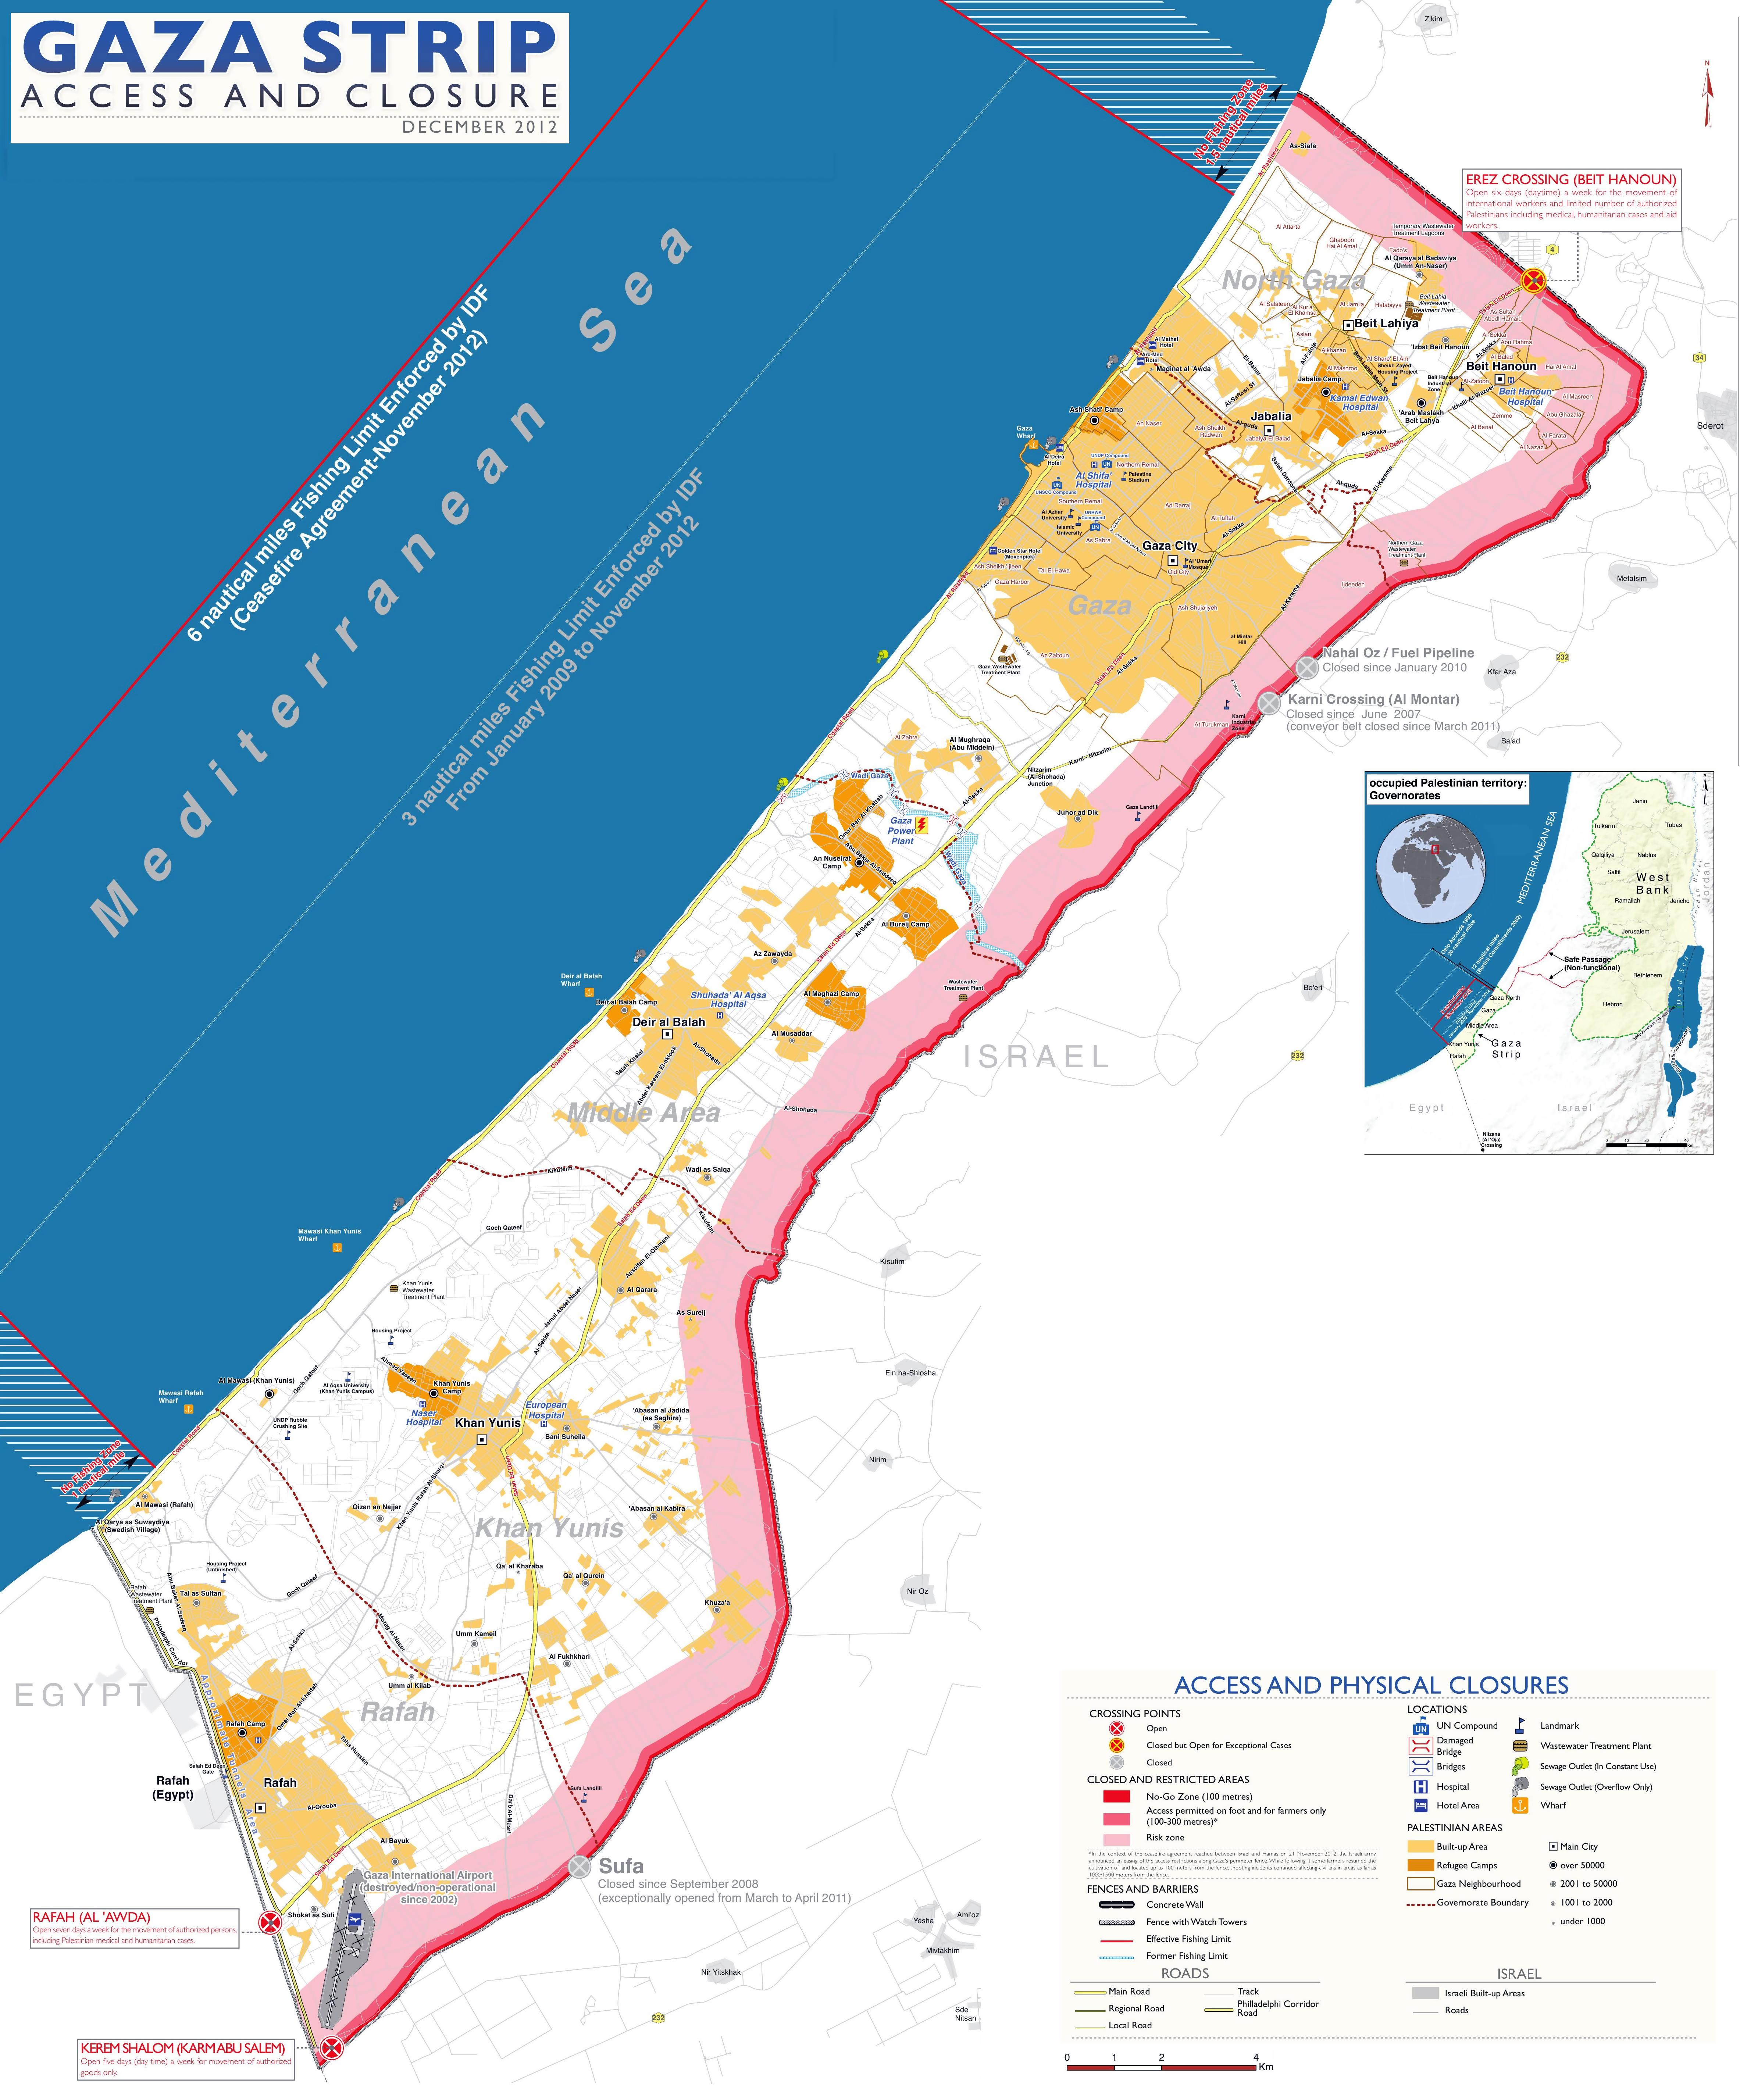 https://upload.wikimedia.org/wikipedia/commons/5/5d/Map_of_Gaza_Strip_with_no-go_zone_2012.jpg